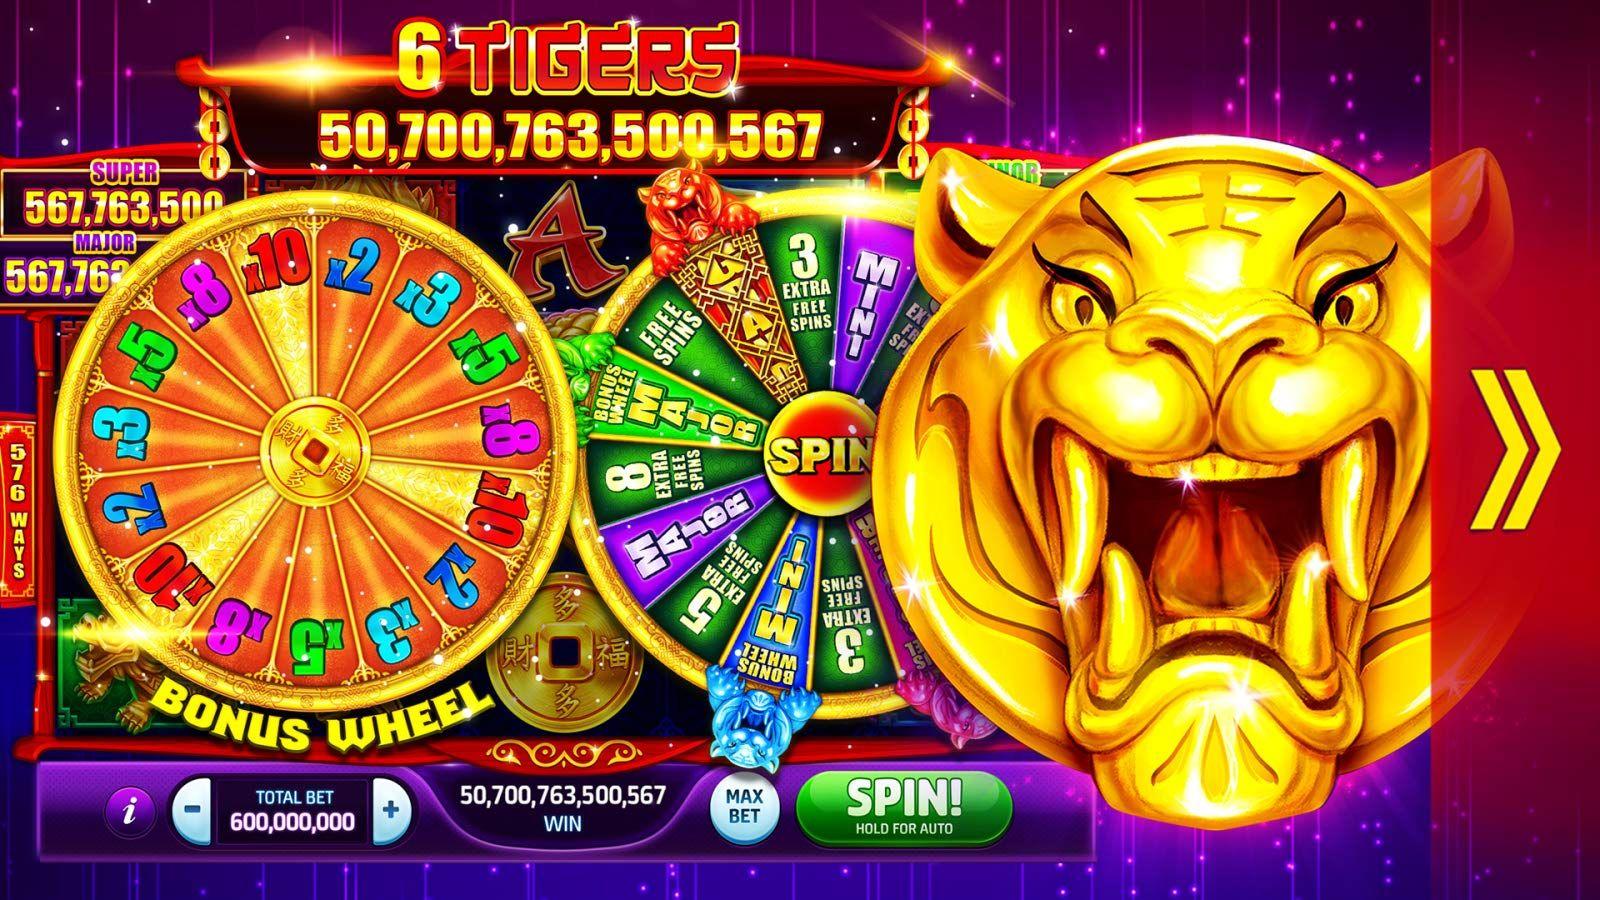 Slotomania Free Slots Casino Games Play Las Vegas Slot Machines Online Amazon Mobile Apps Free Slots Casino Casino Slots Vegas Slots